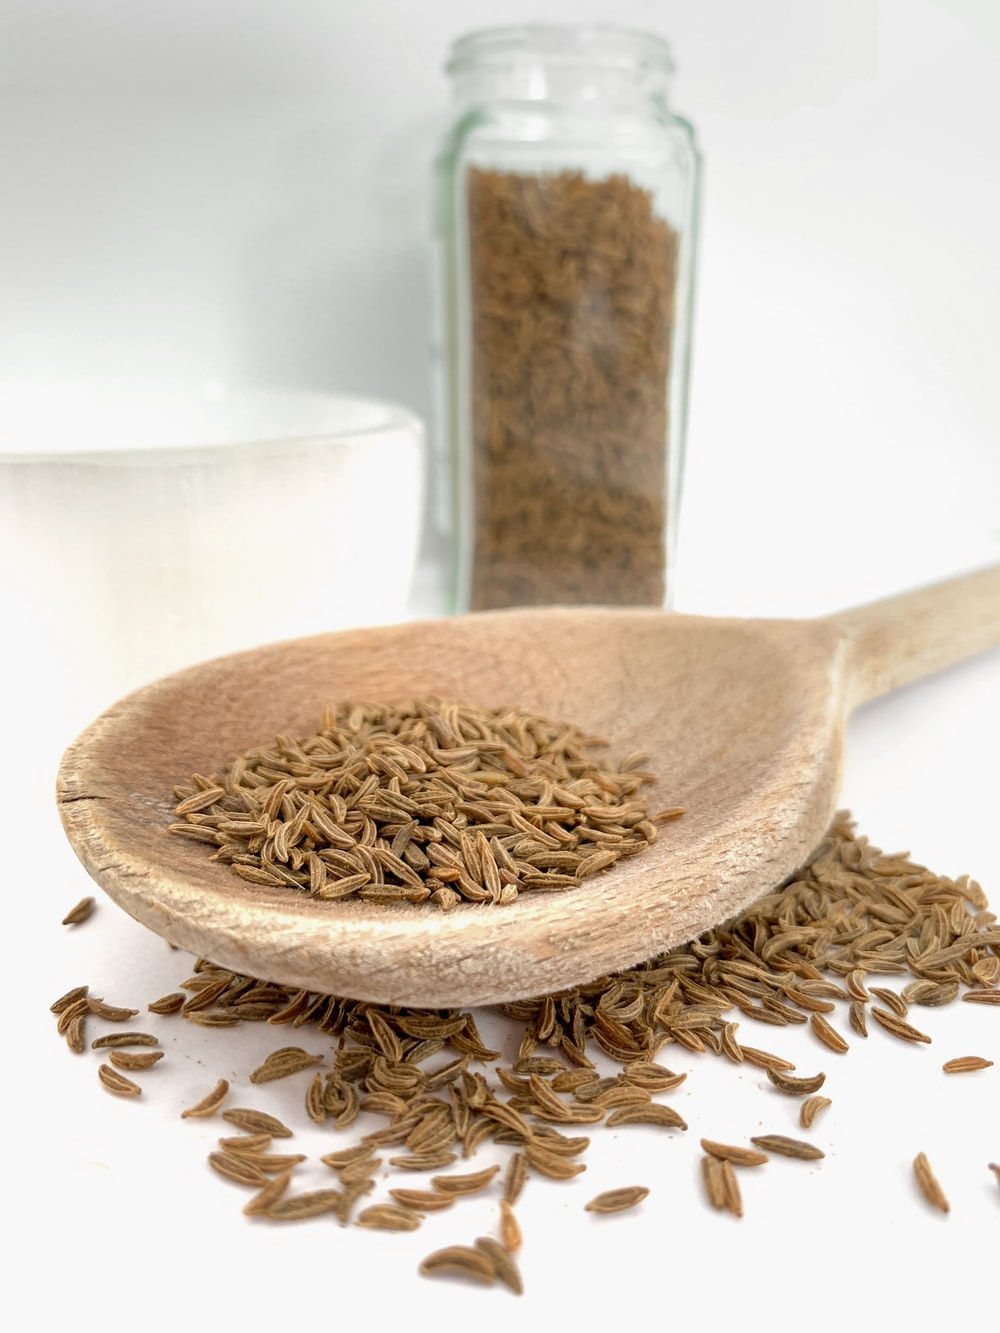 brown wooden spoon on white ceramic bowl